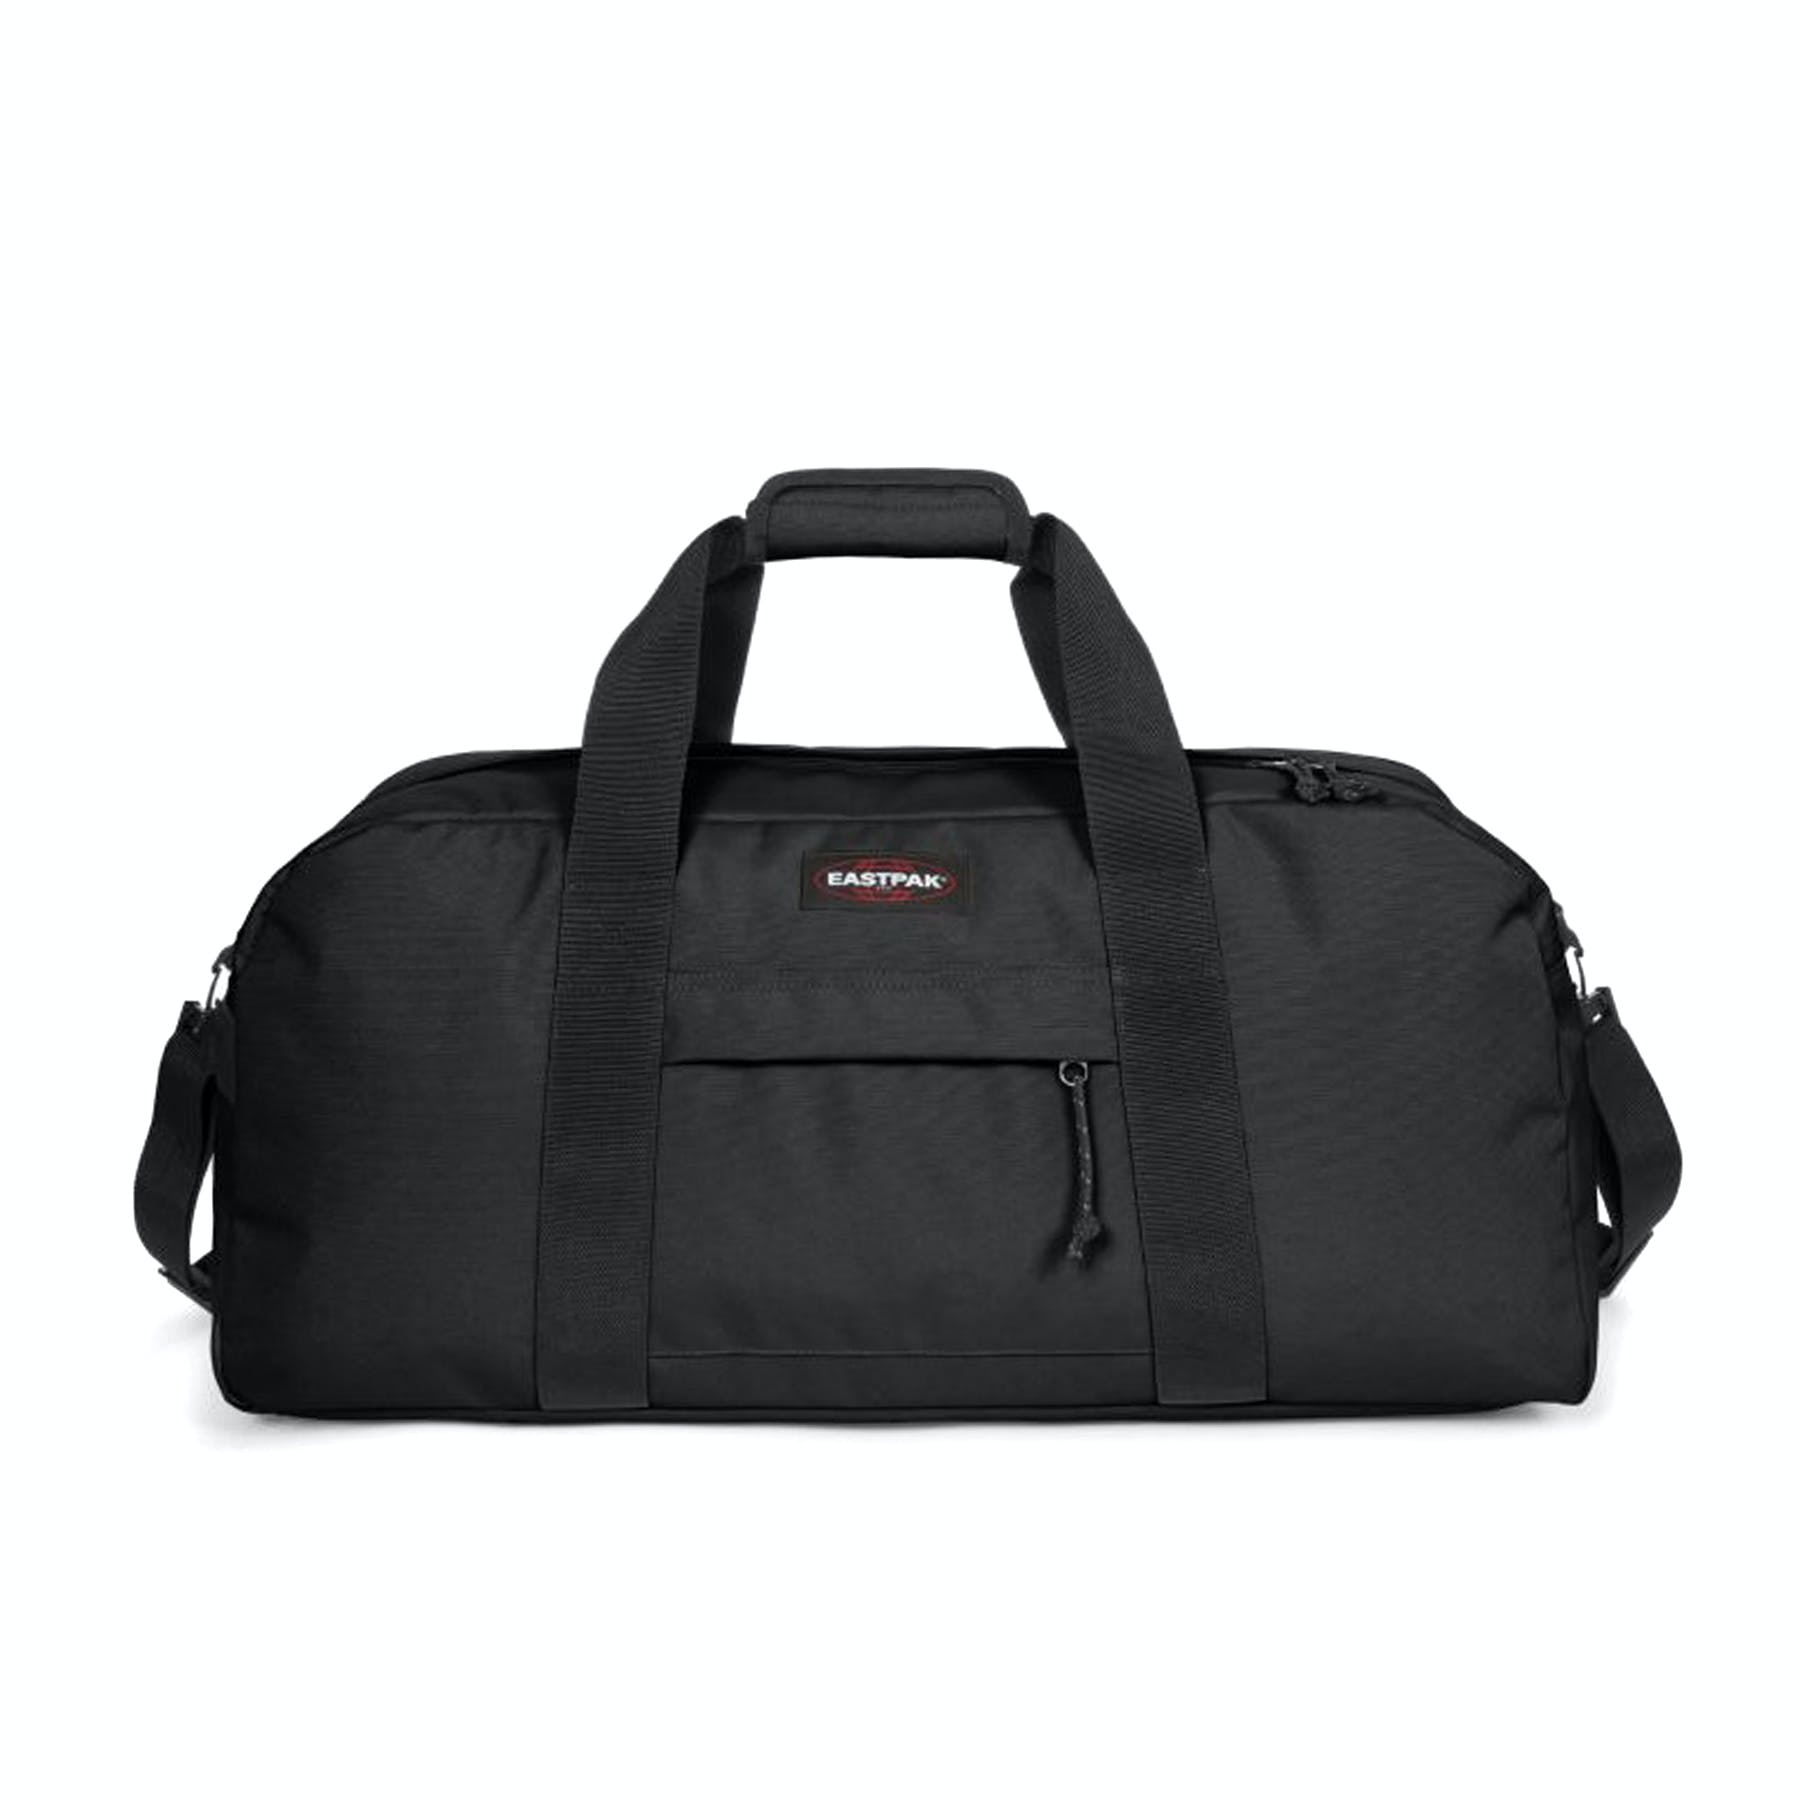 Eastpak Station + Duffle Bag